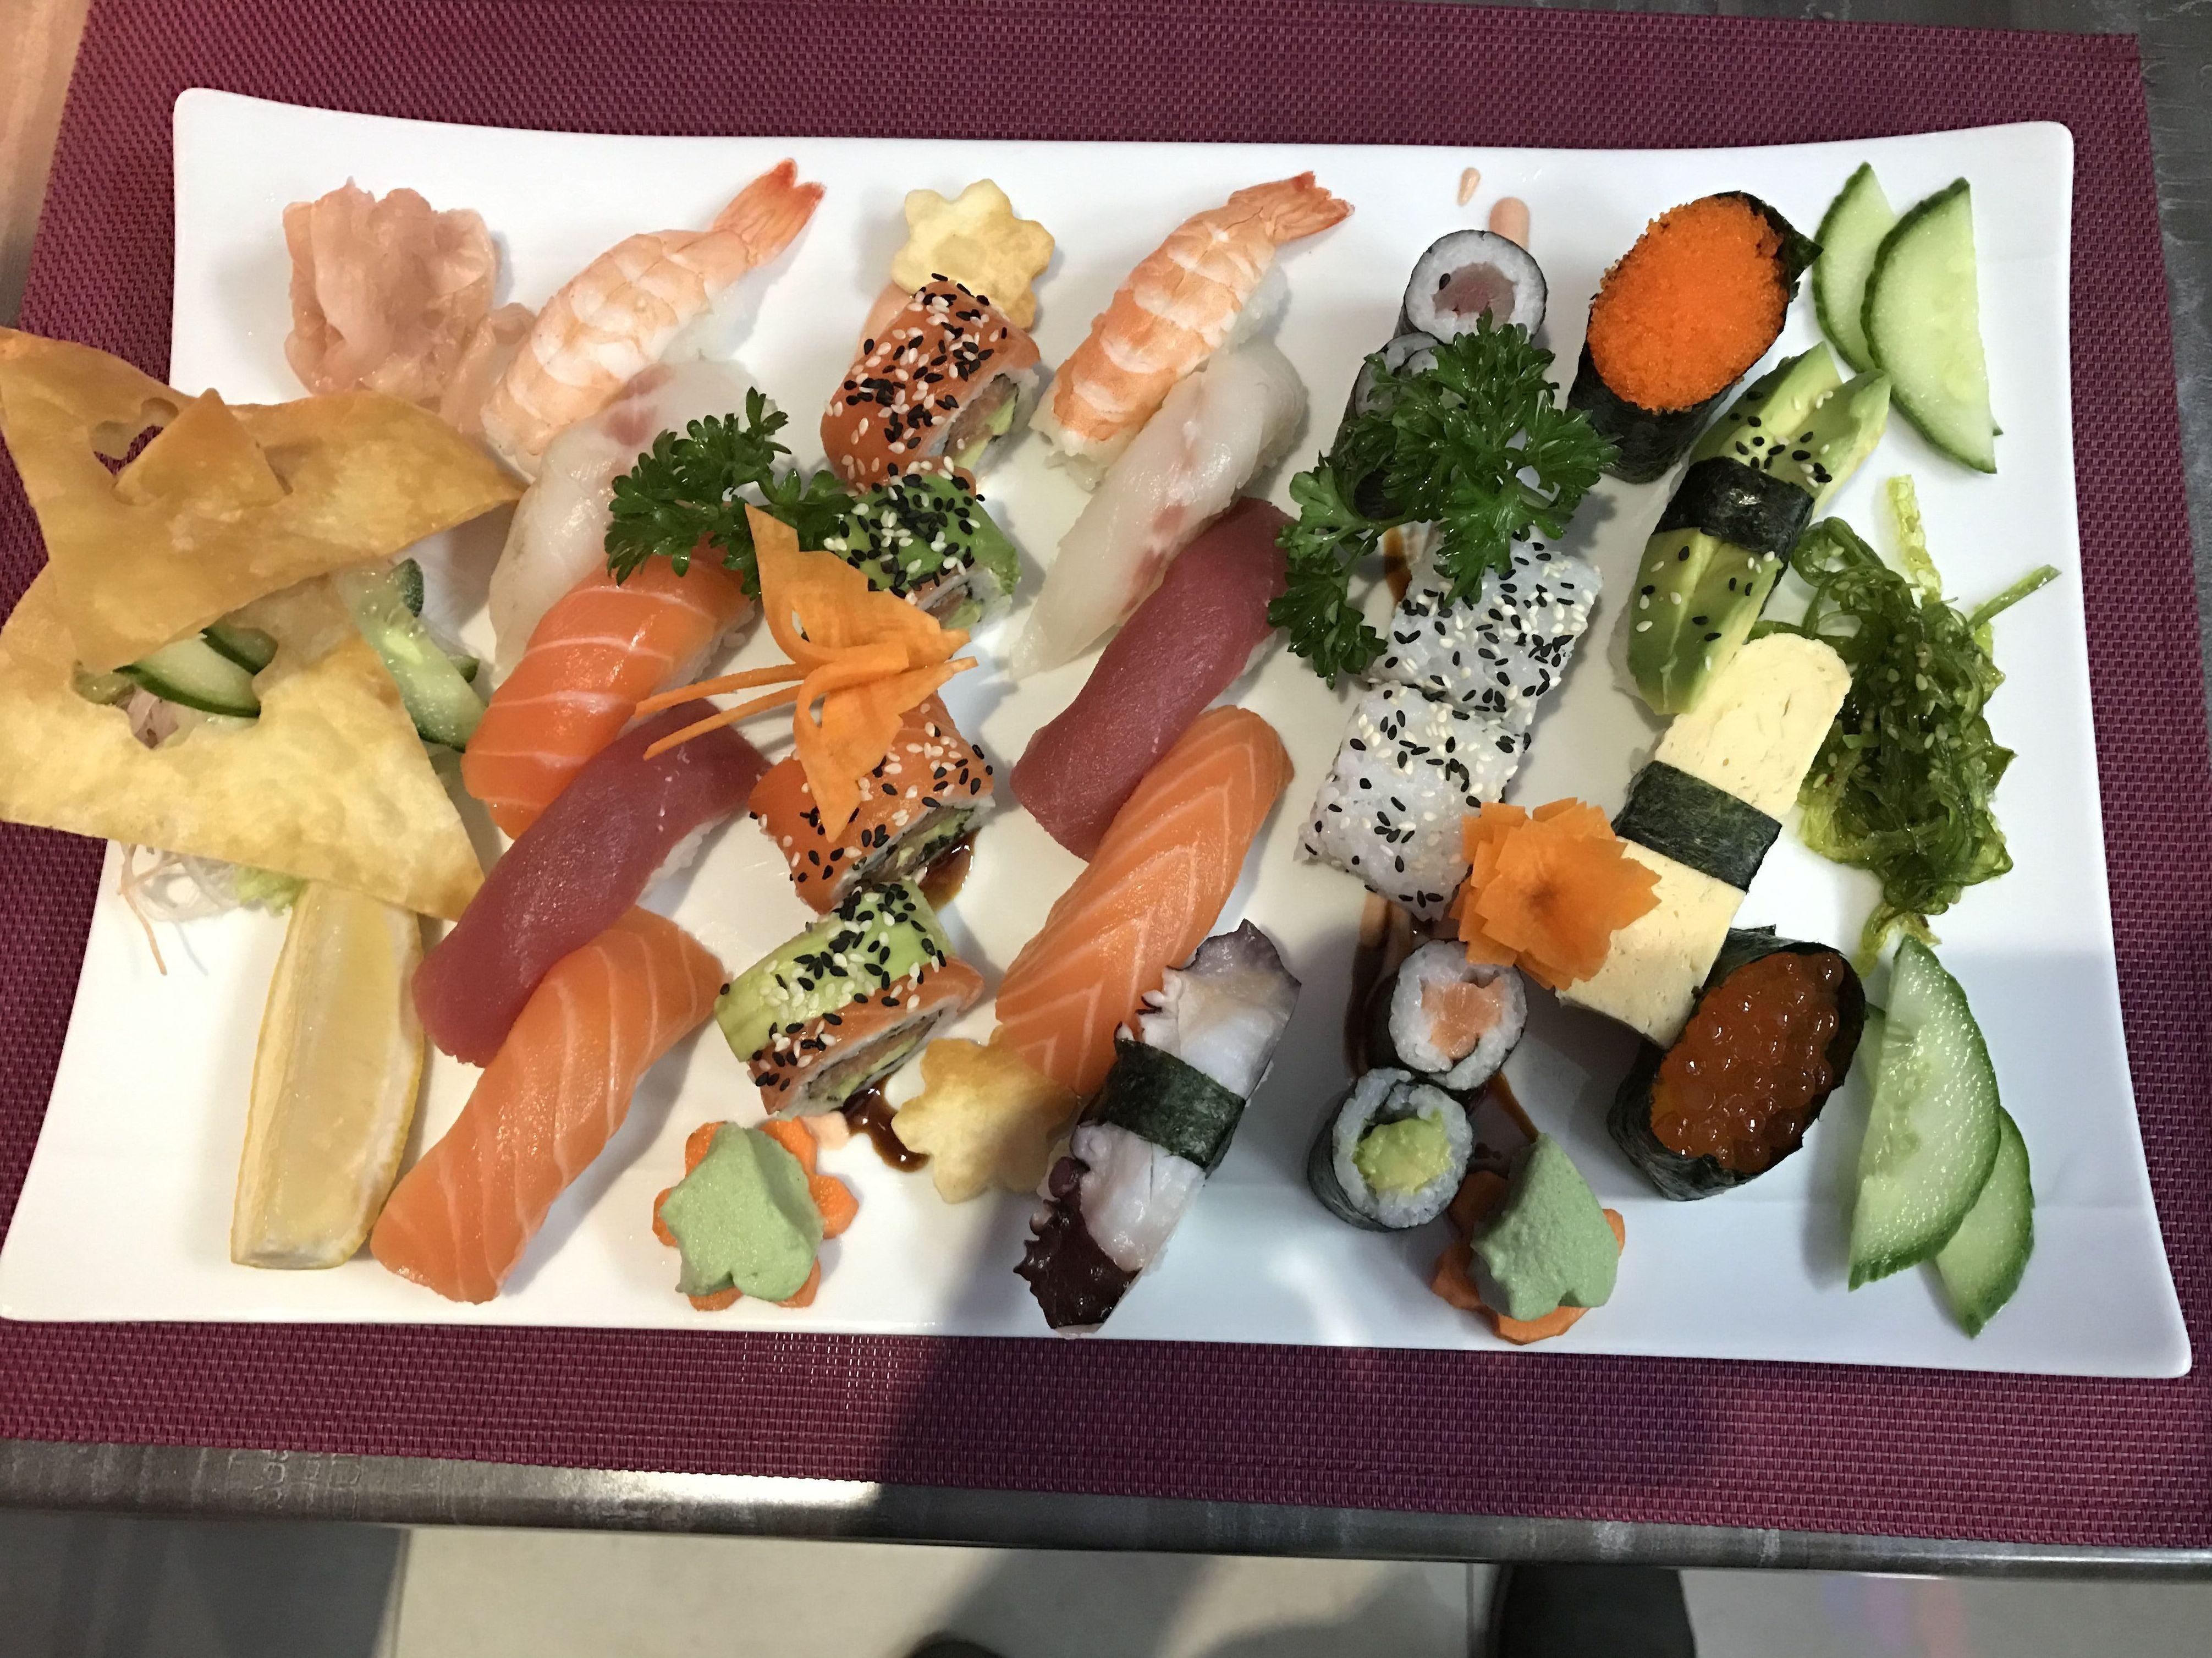 Foto 5 de Fusion food restaurant en San Bartolomé de Tirajana | Restaurante SushiMex